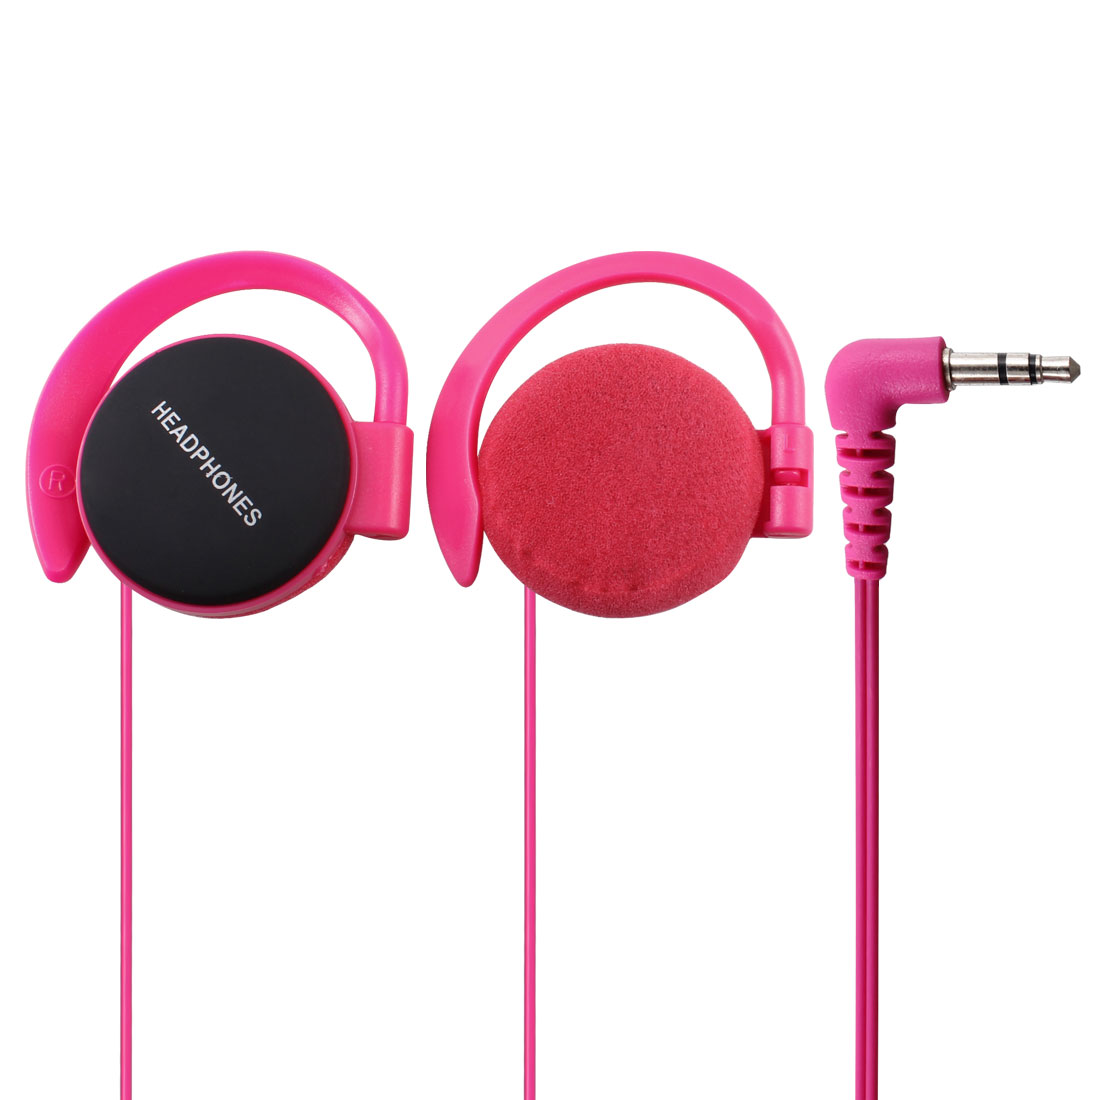 3.5mm Jack Clip on Stereo Headphone Earphone Fuchsia for Cell Phone